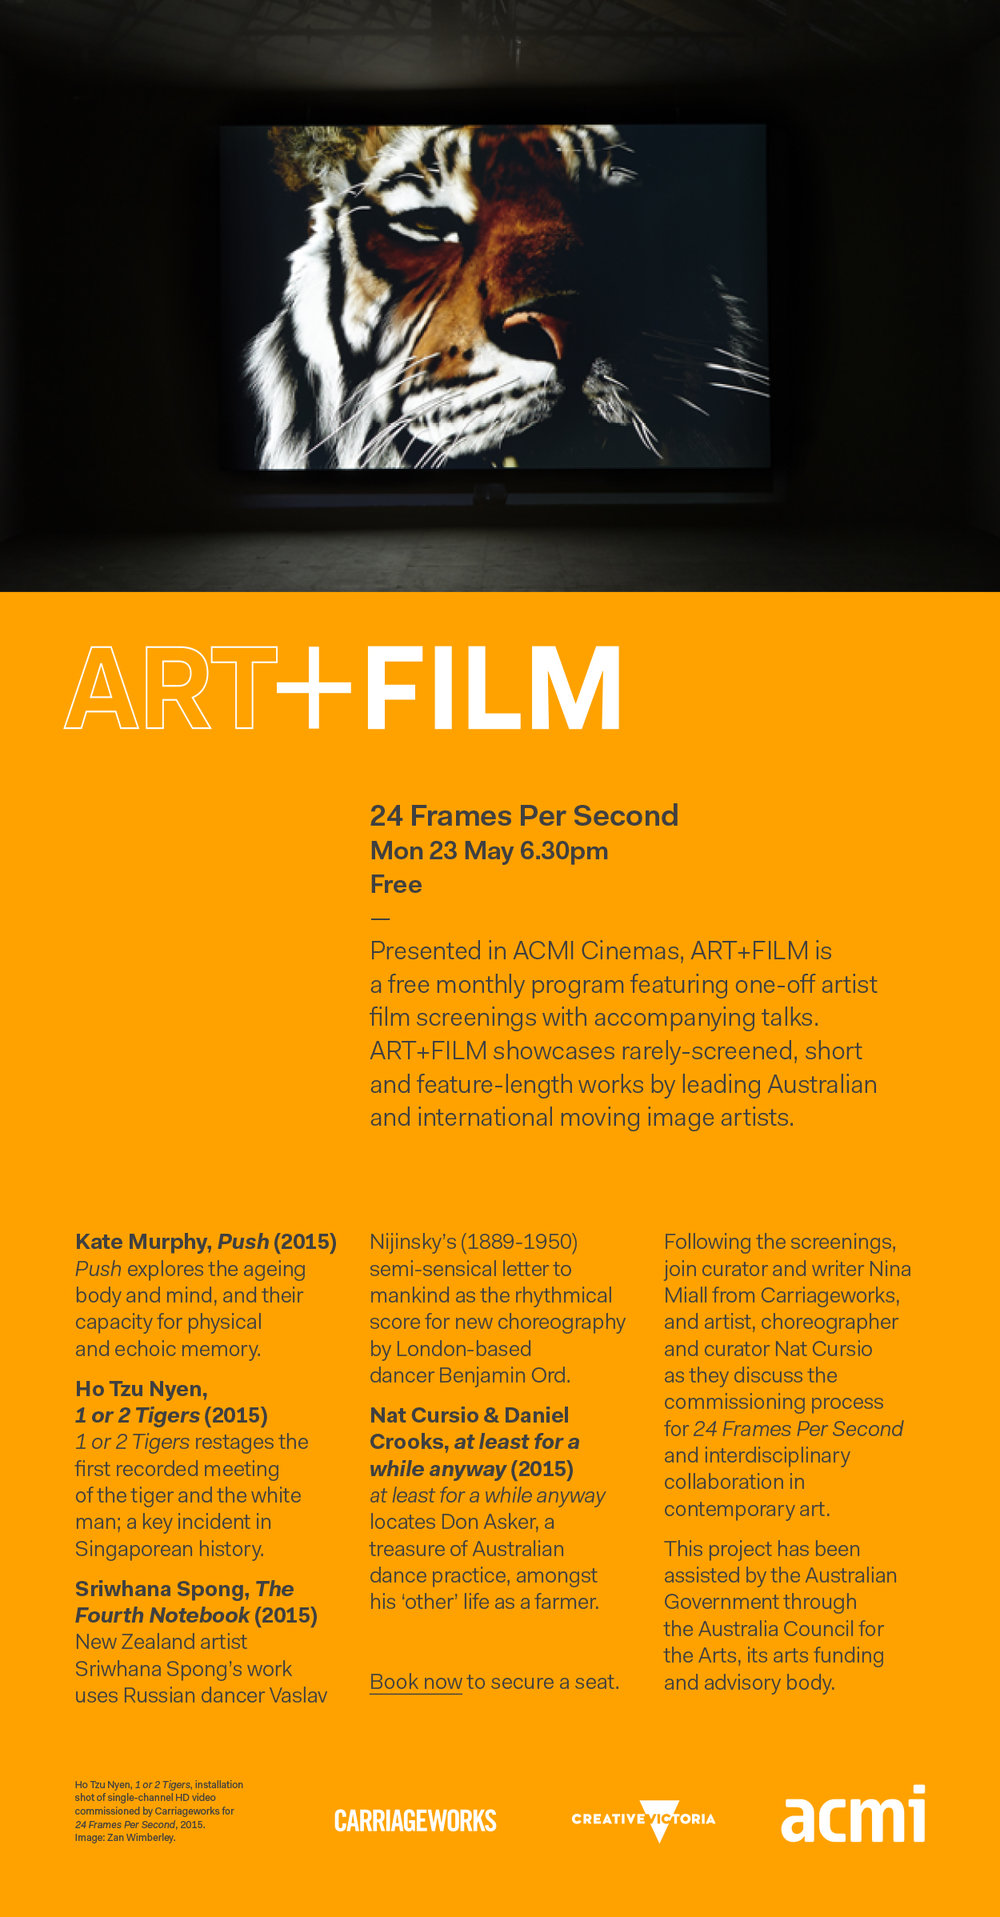 5845_ArtFilm_Email_24fps_FA.jpg